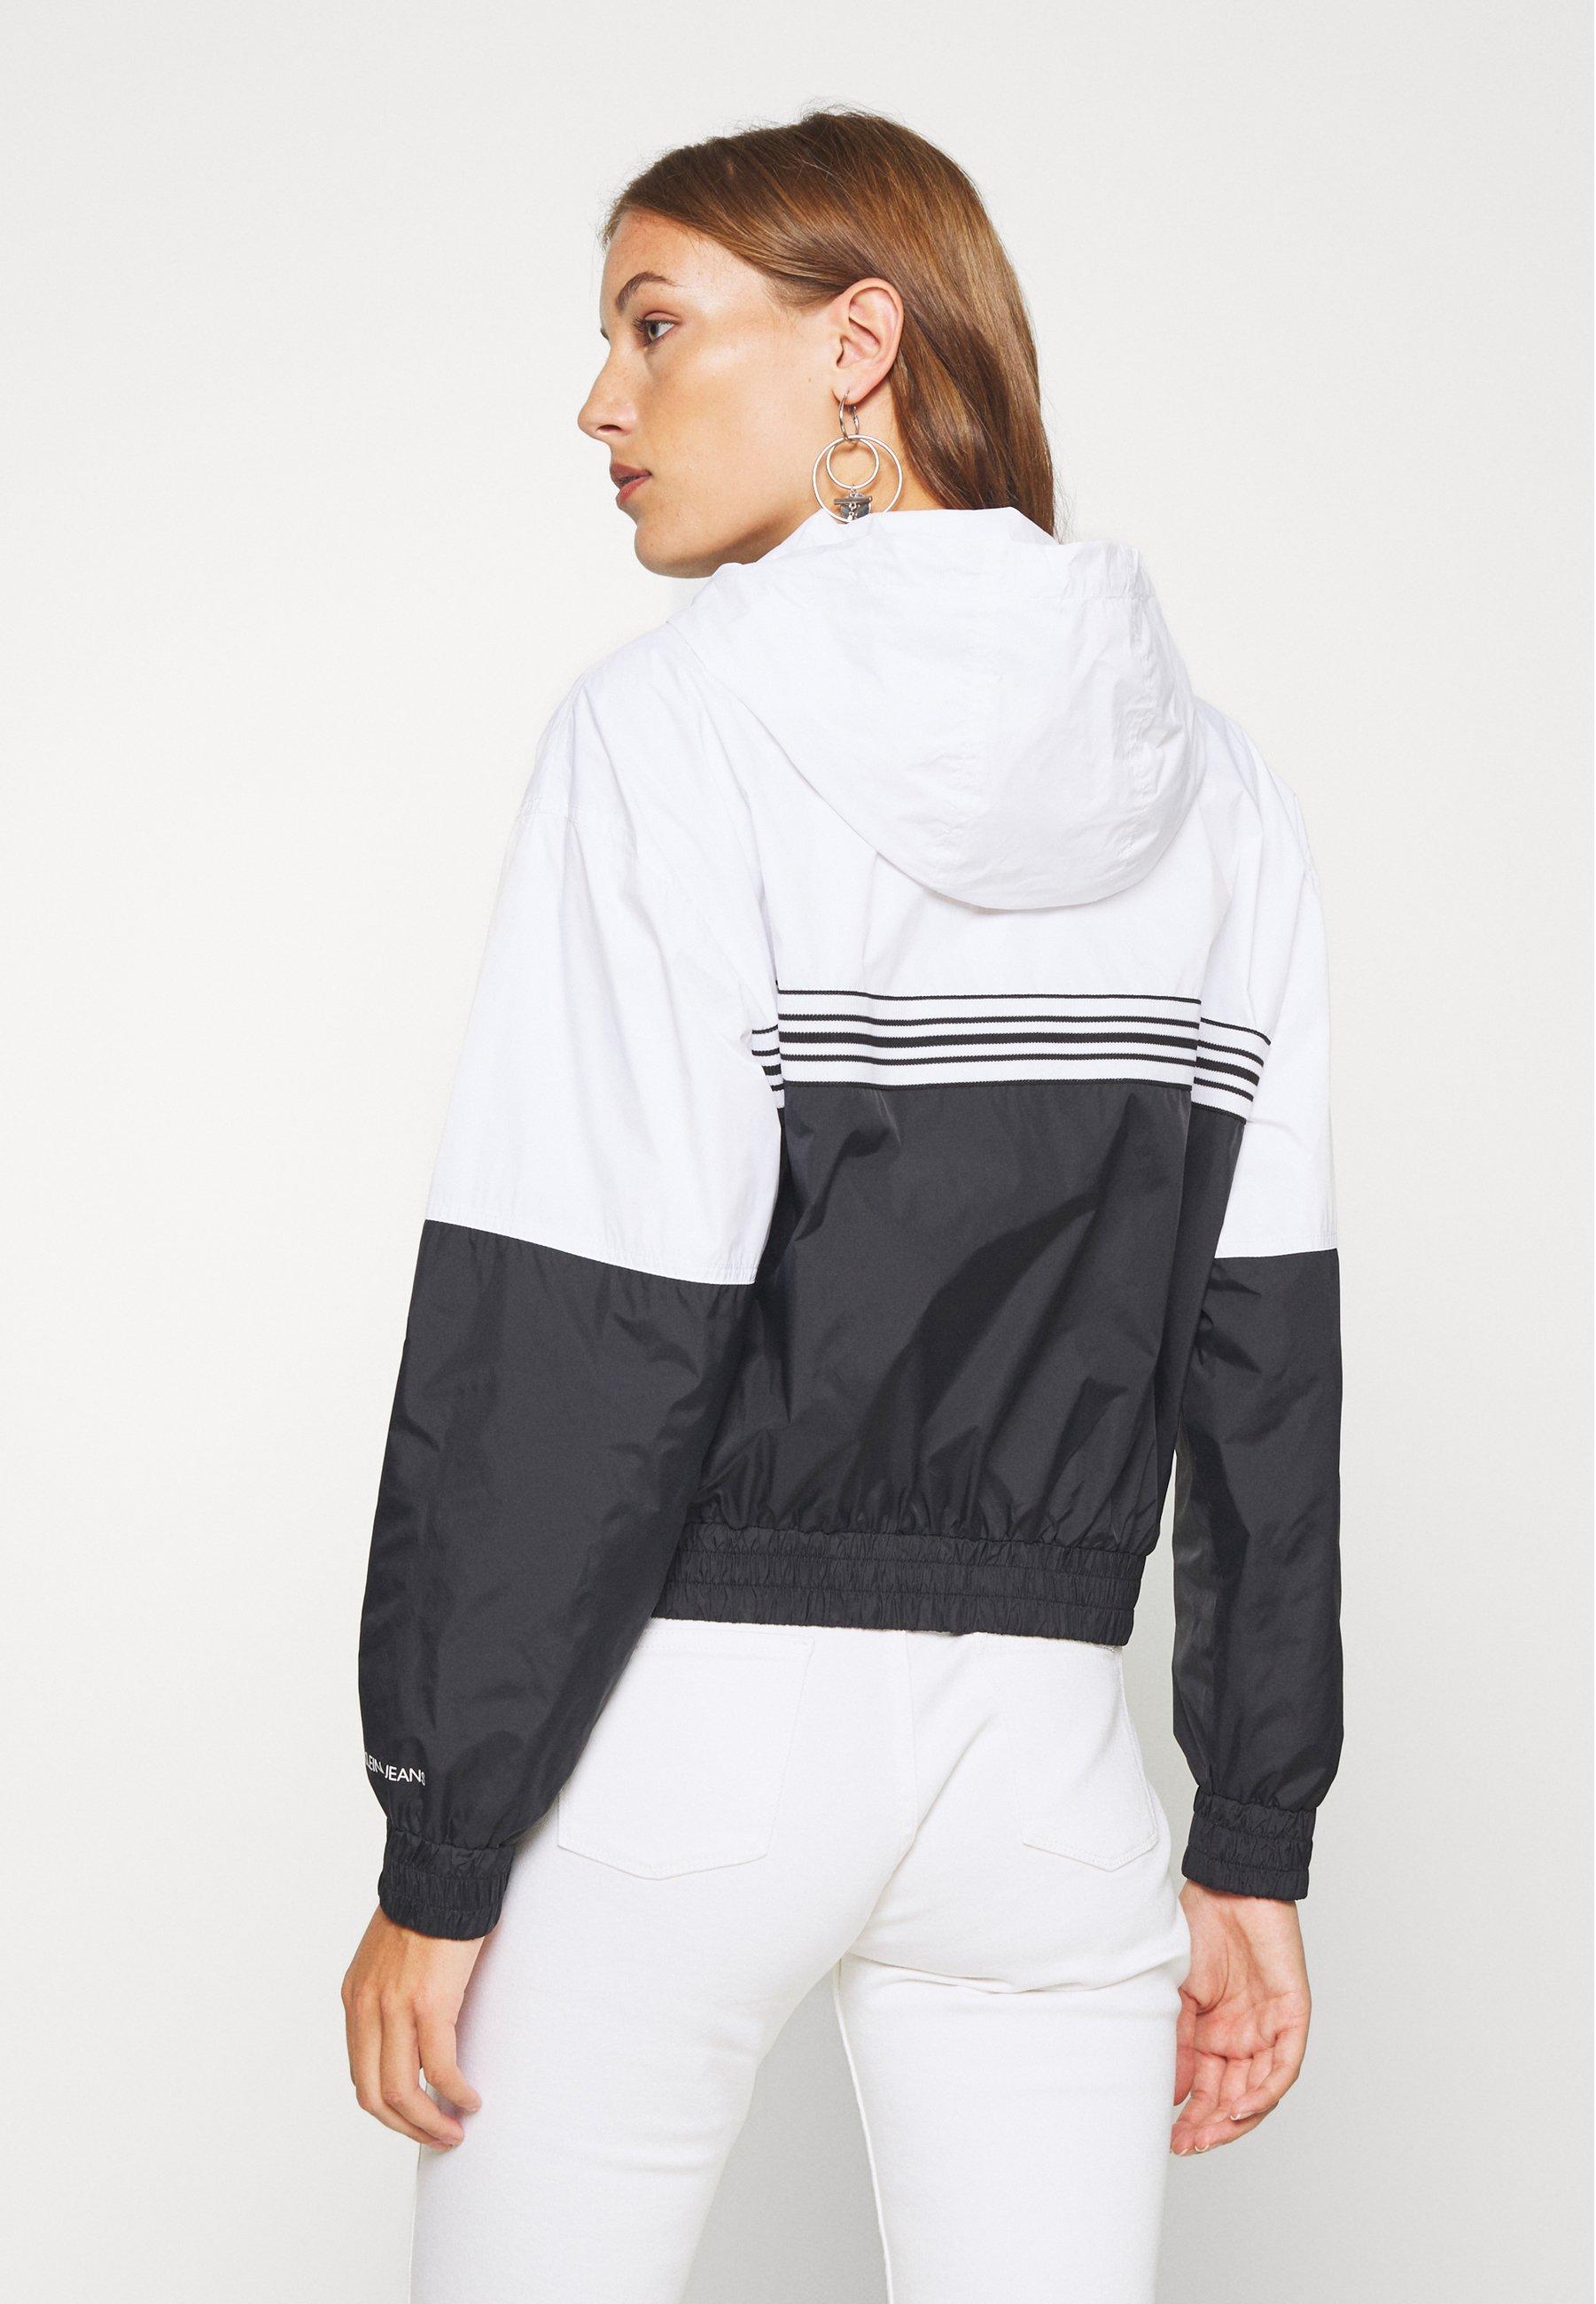 Inexpensive Women's Clothing Calvin Klein Jeans STRIPE TAPE HOODED WINDBREAKER Summer jacket black qOvtLdmE5